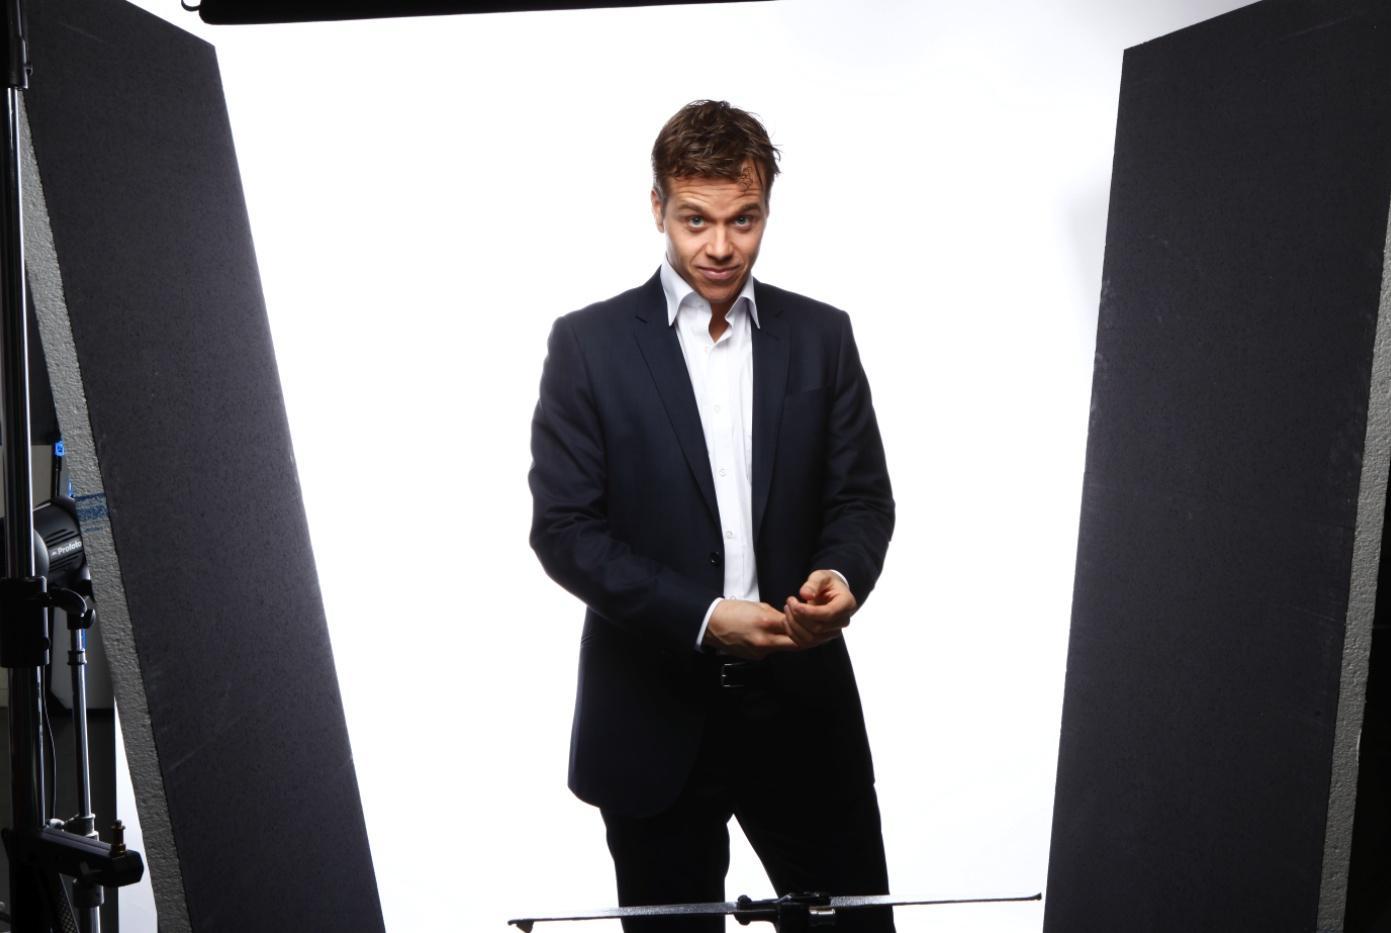 Lars Oostveen - Presenter Producer   about.me